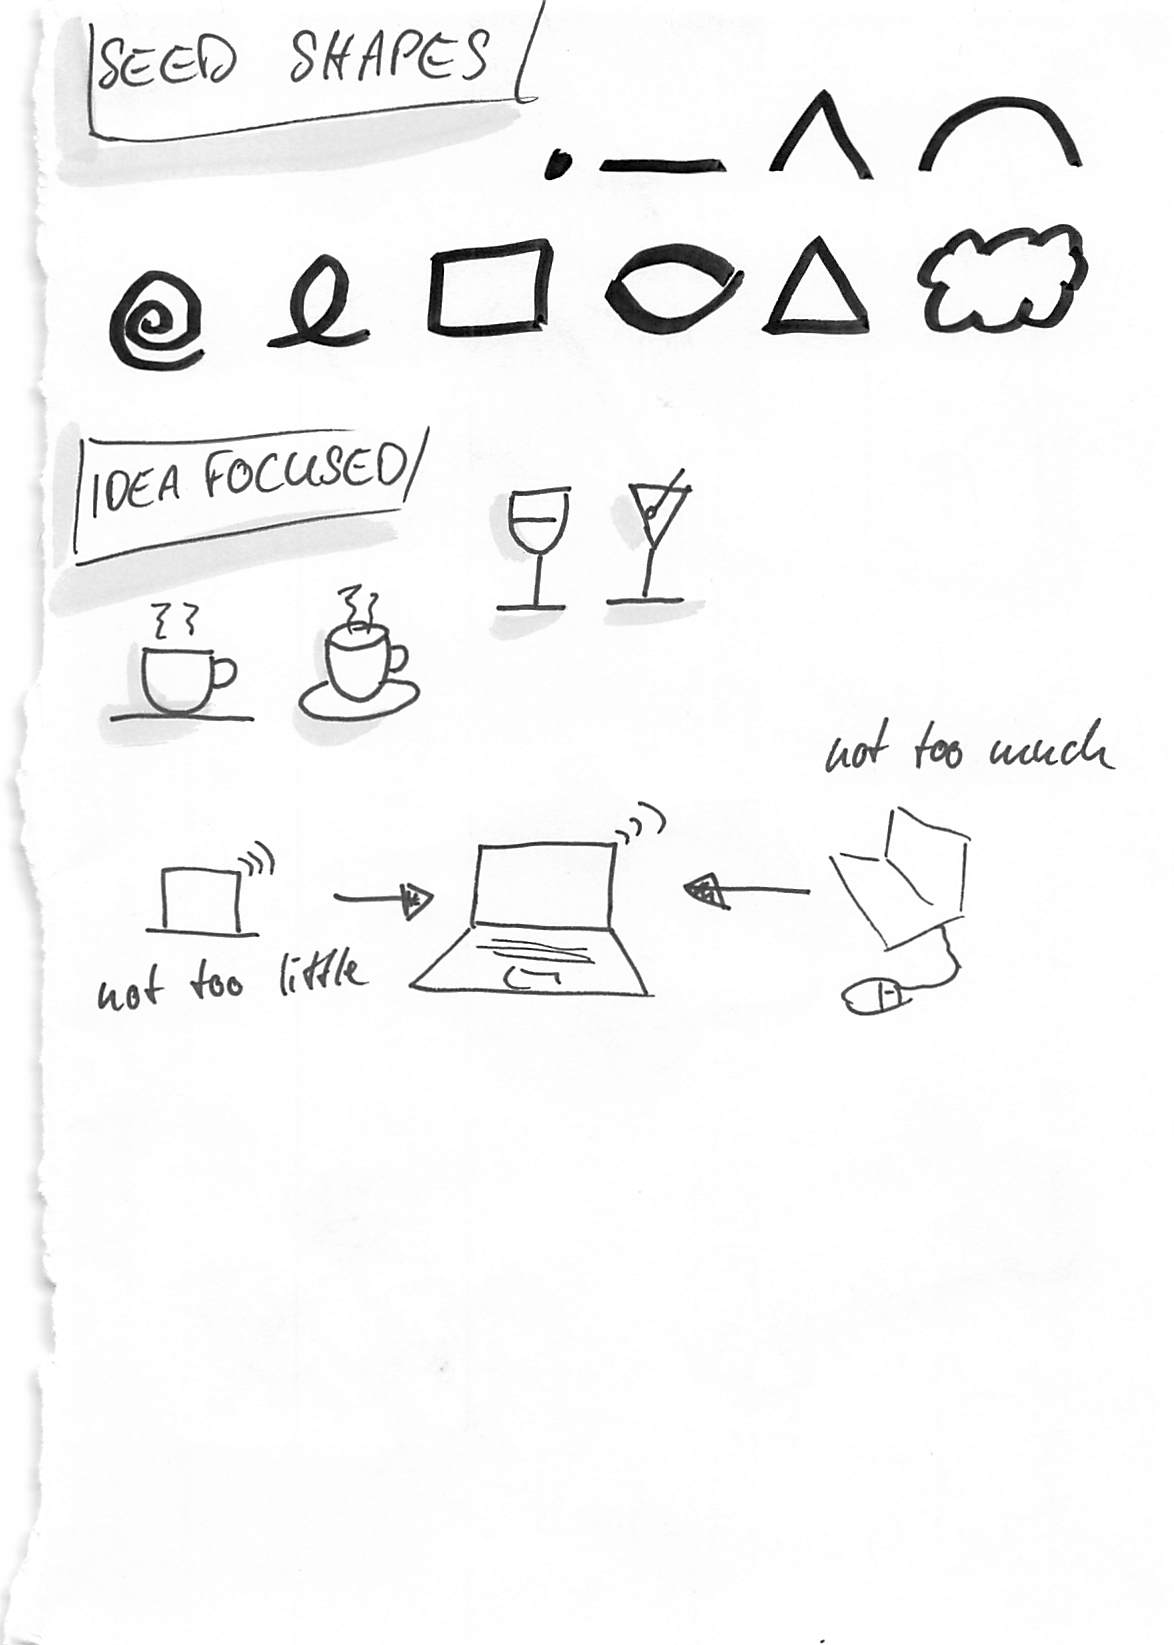 Visual Thinking Skills: Visualization Workshop - Shapes